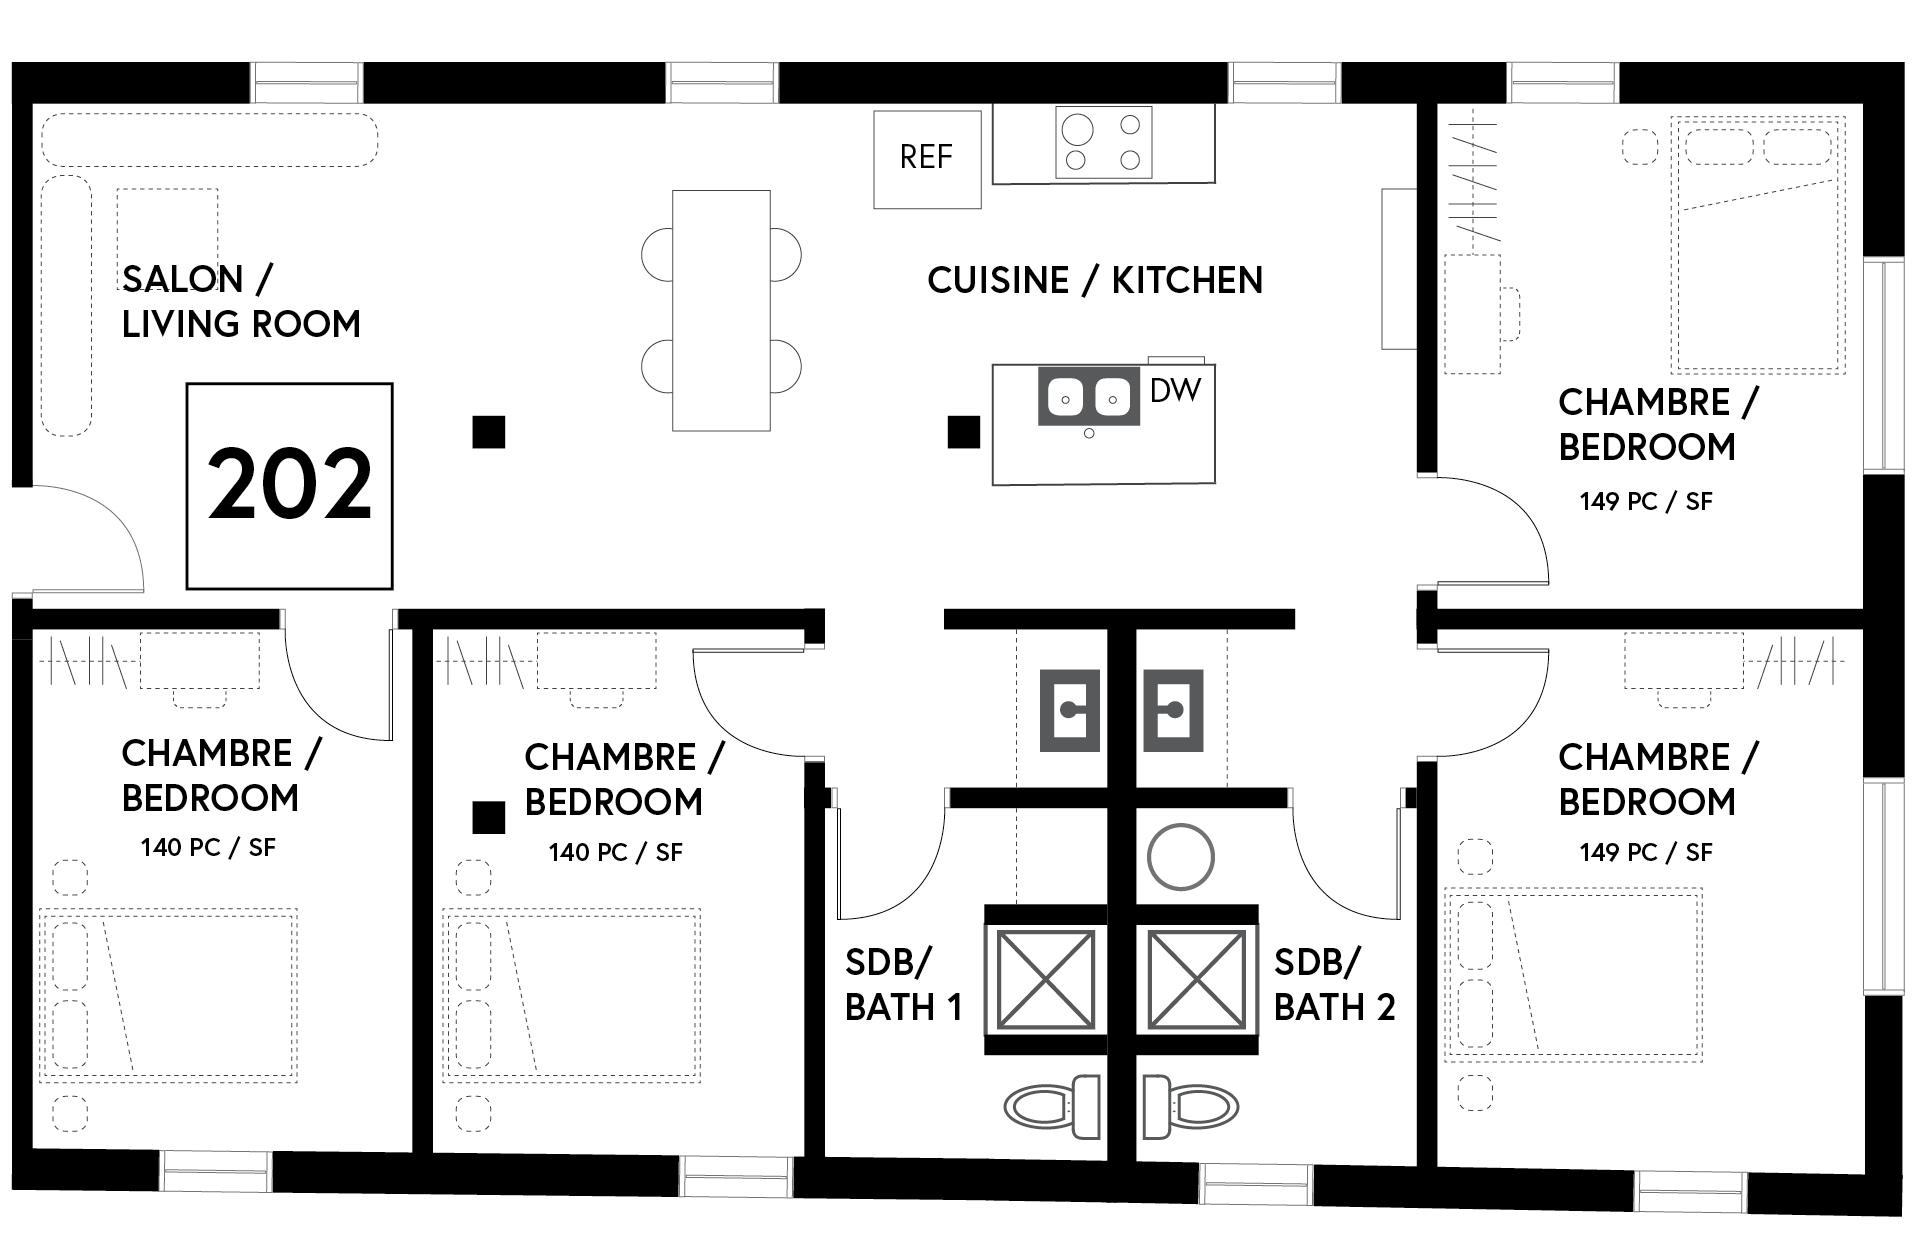 Plan : 1323 PC / Floor Plan : 1323 SF